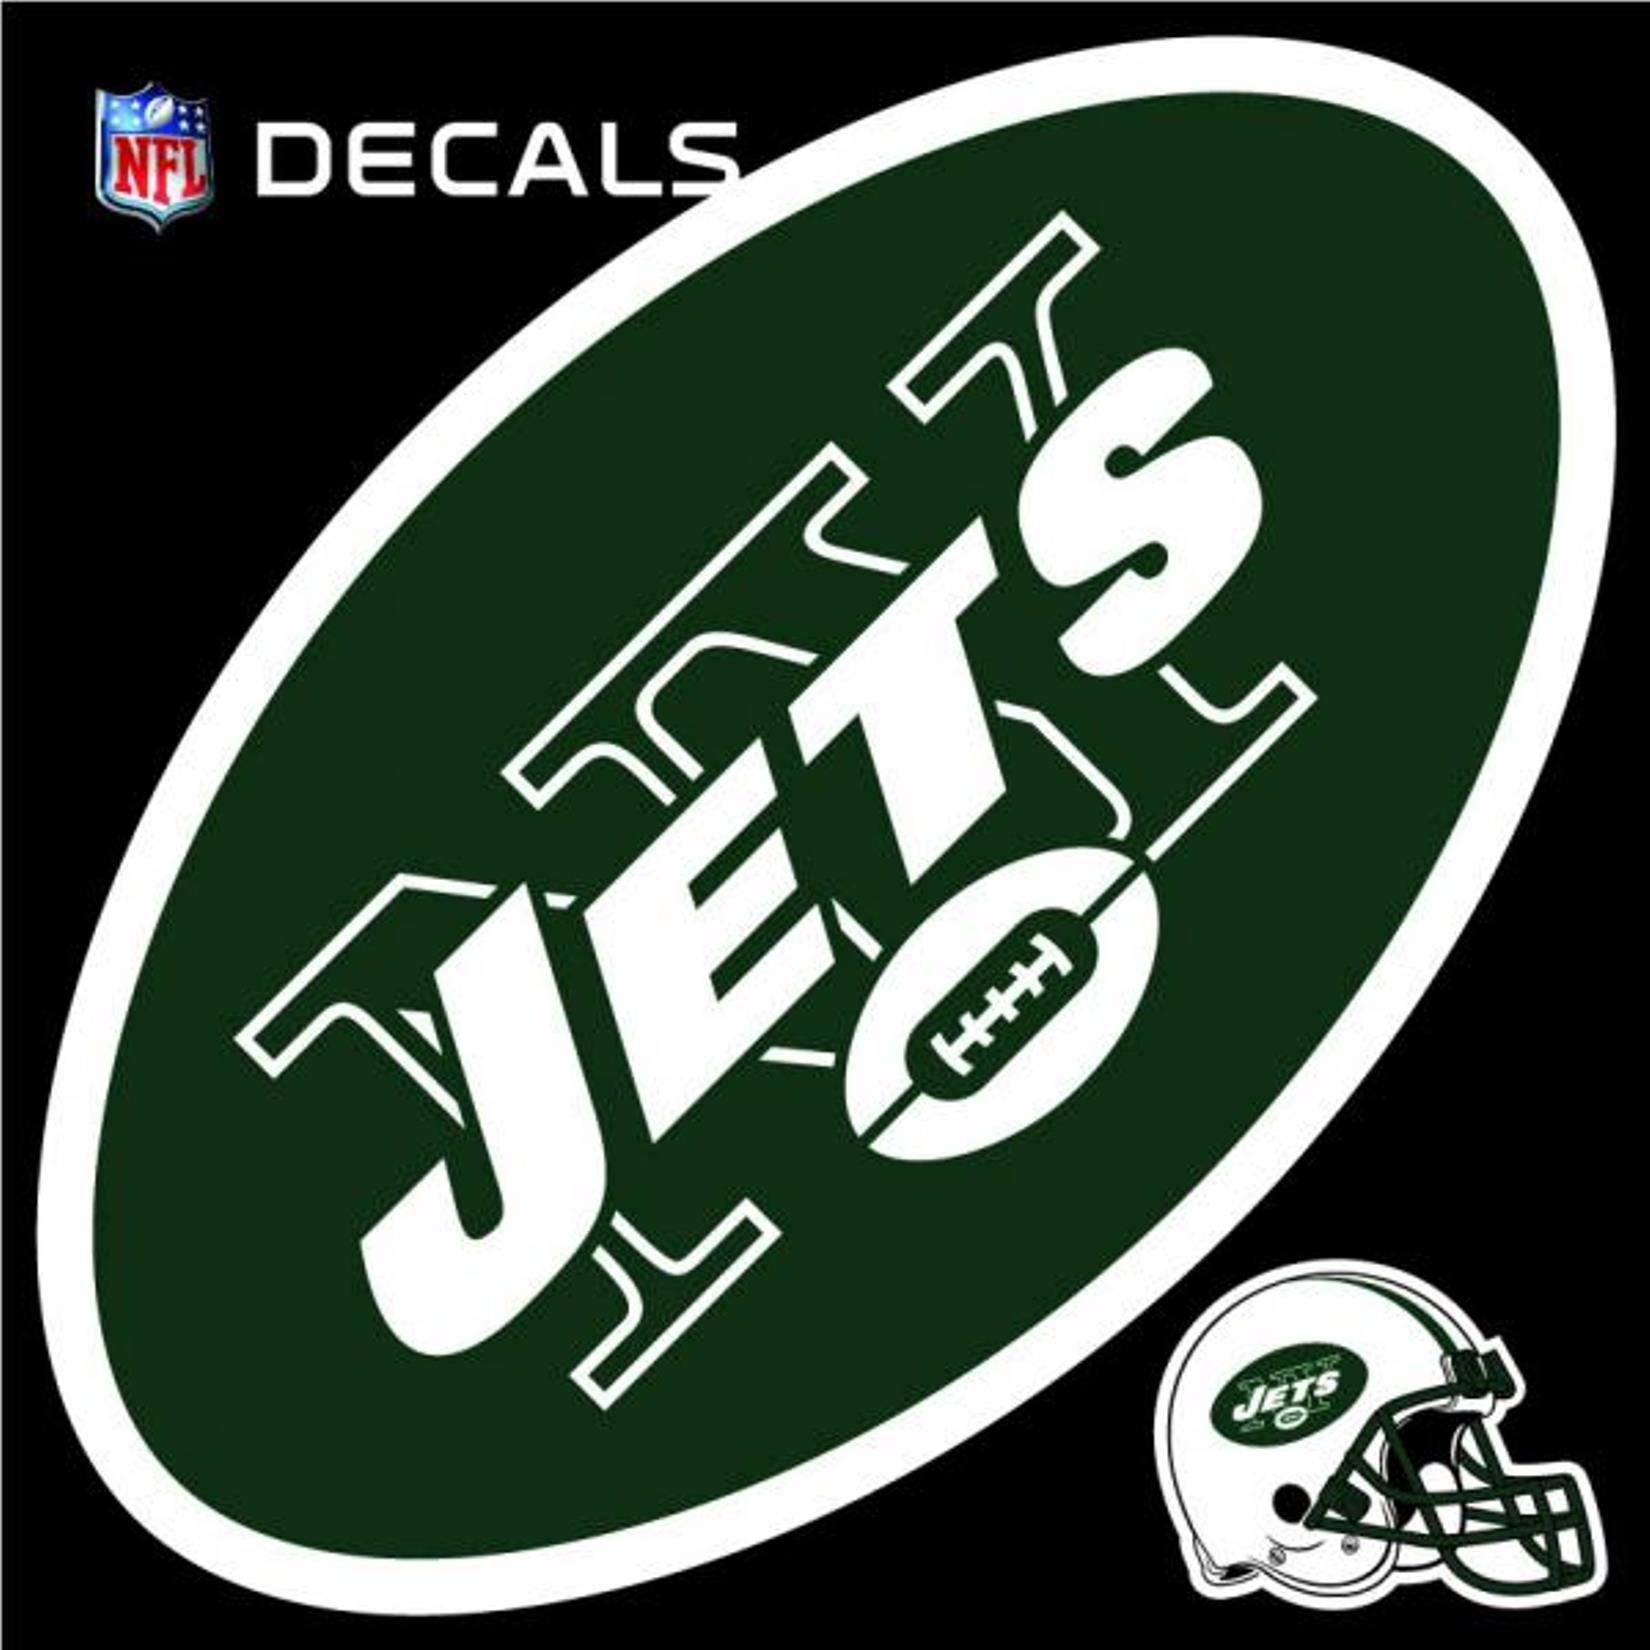 Stockdale Technologies New York Jets 12'' LOGO Decal with Bonus Decal Vinyl Reusable Auto Home Football